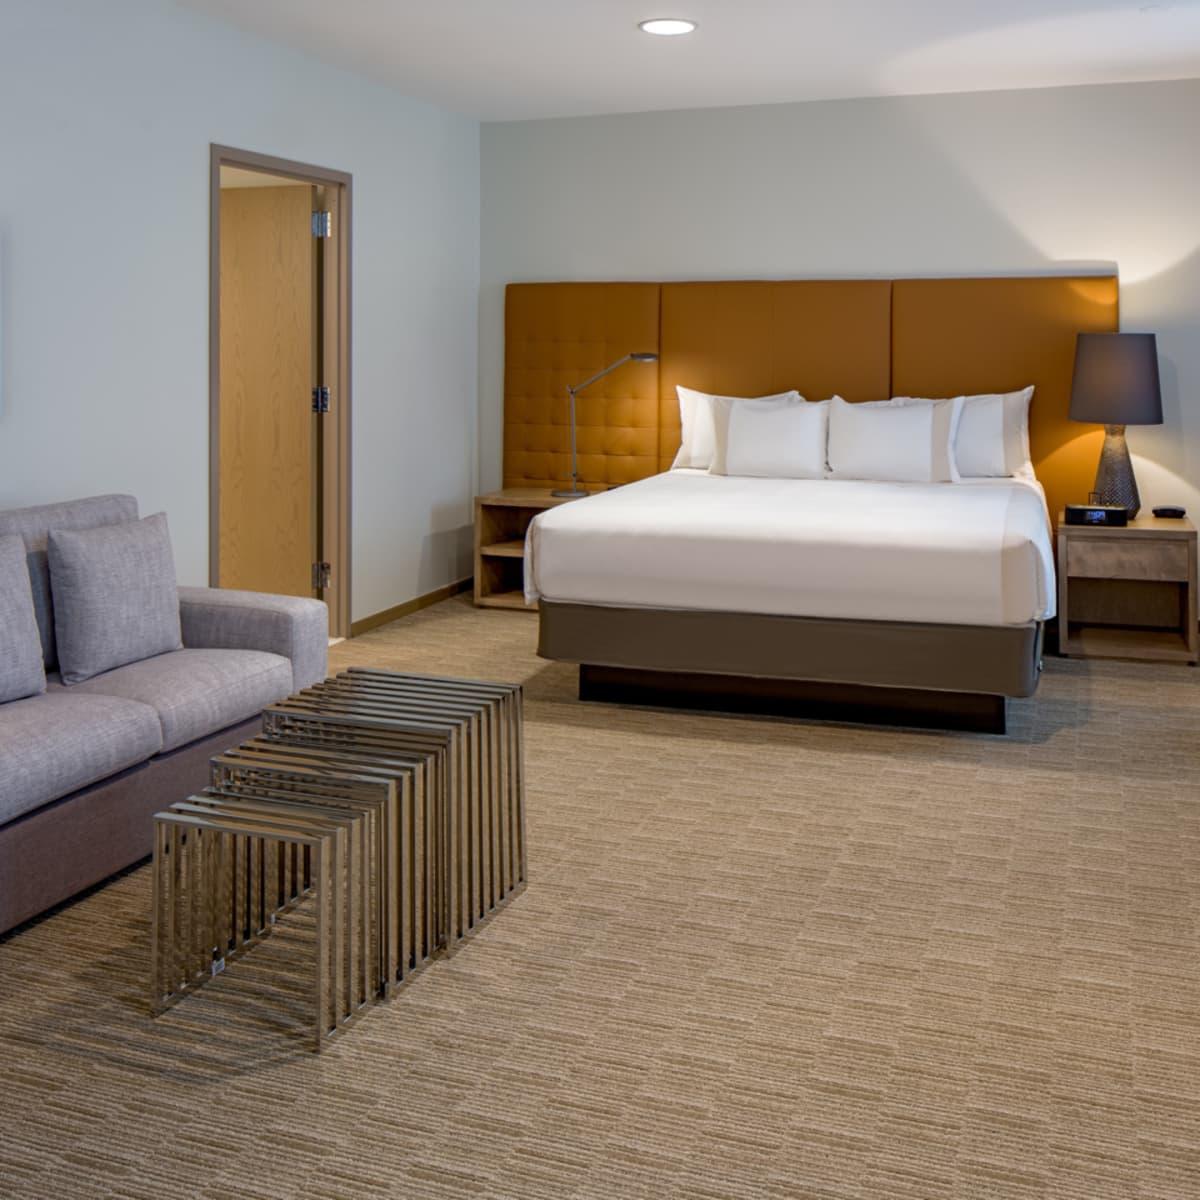 Hyatt Regency two story suites master bedroom